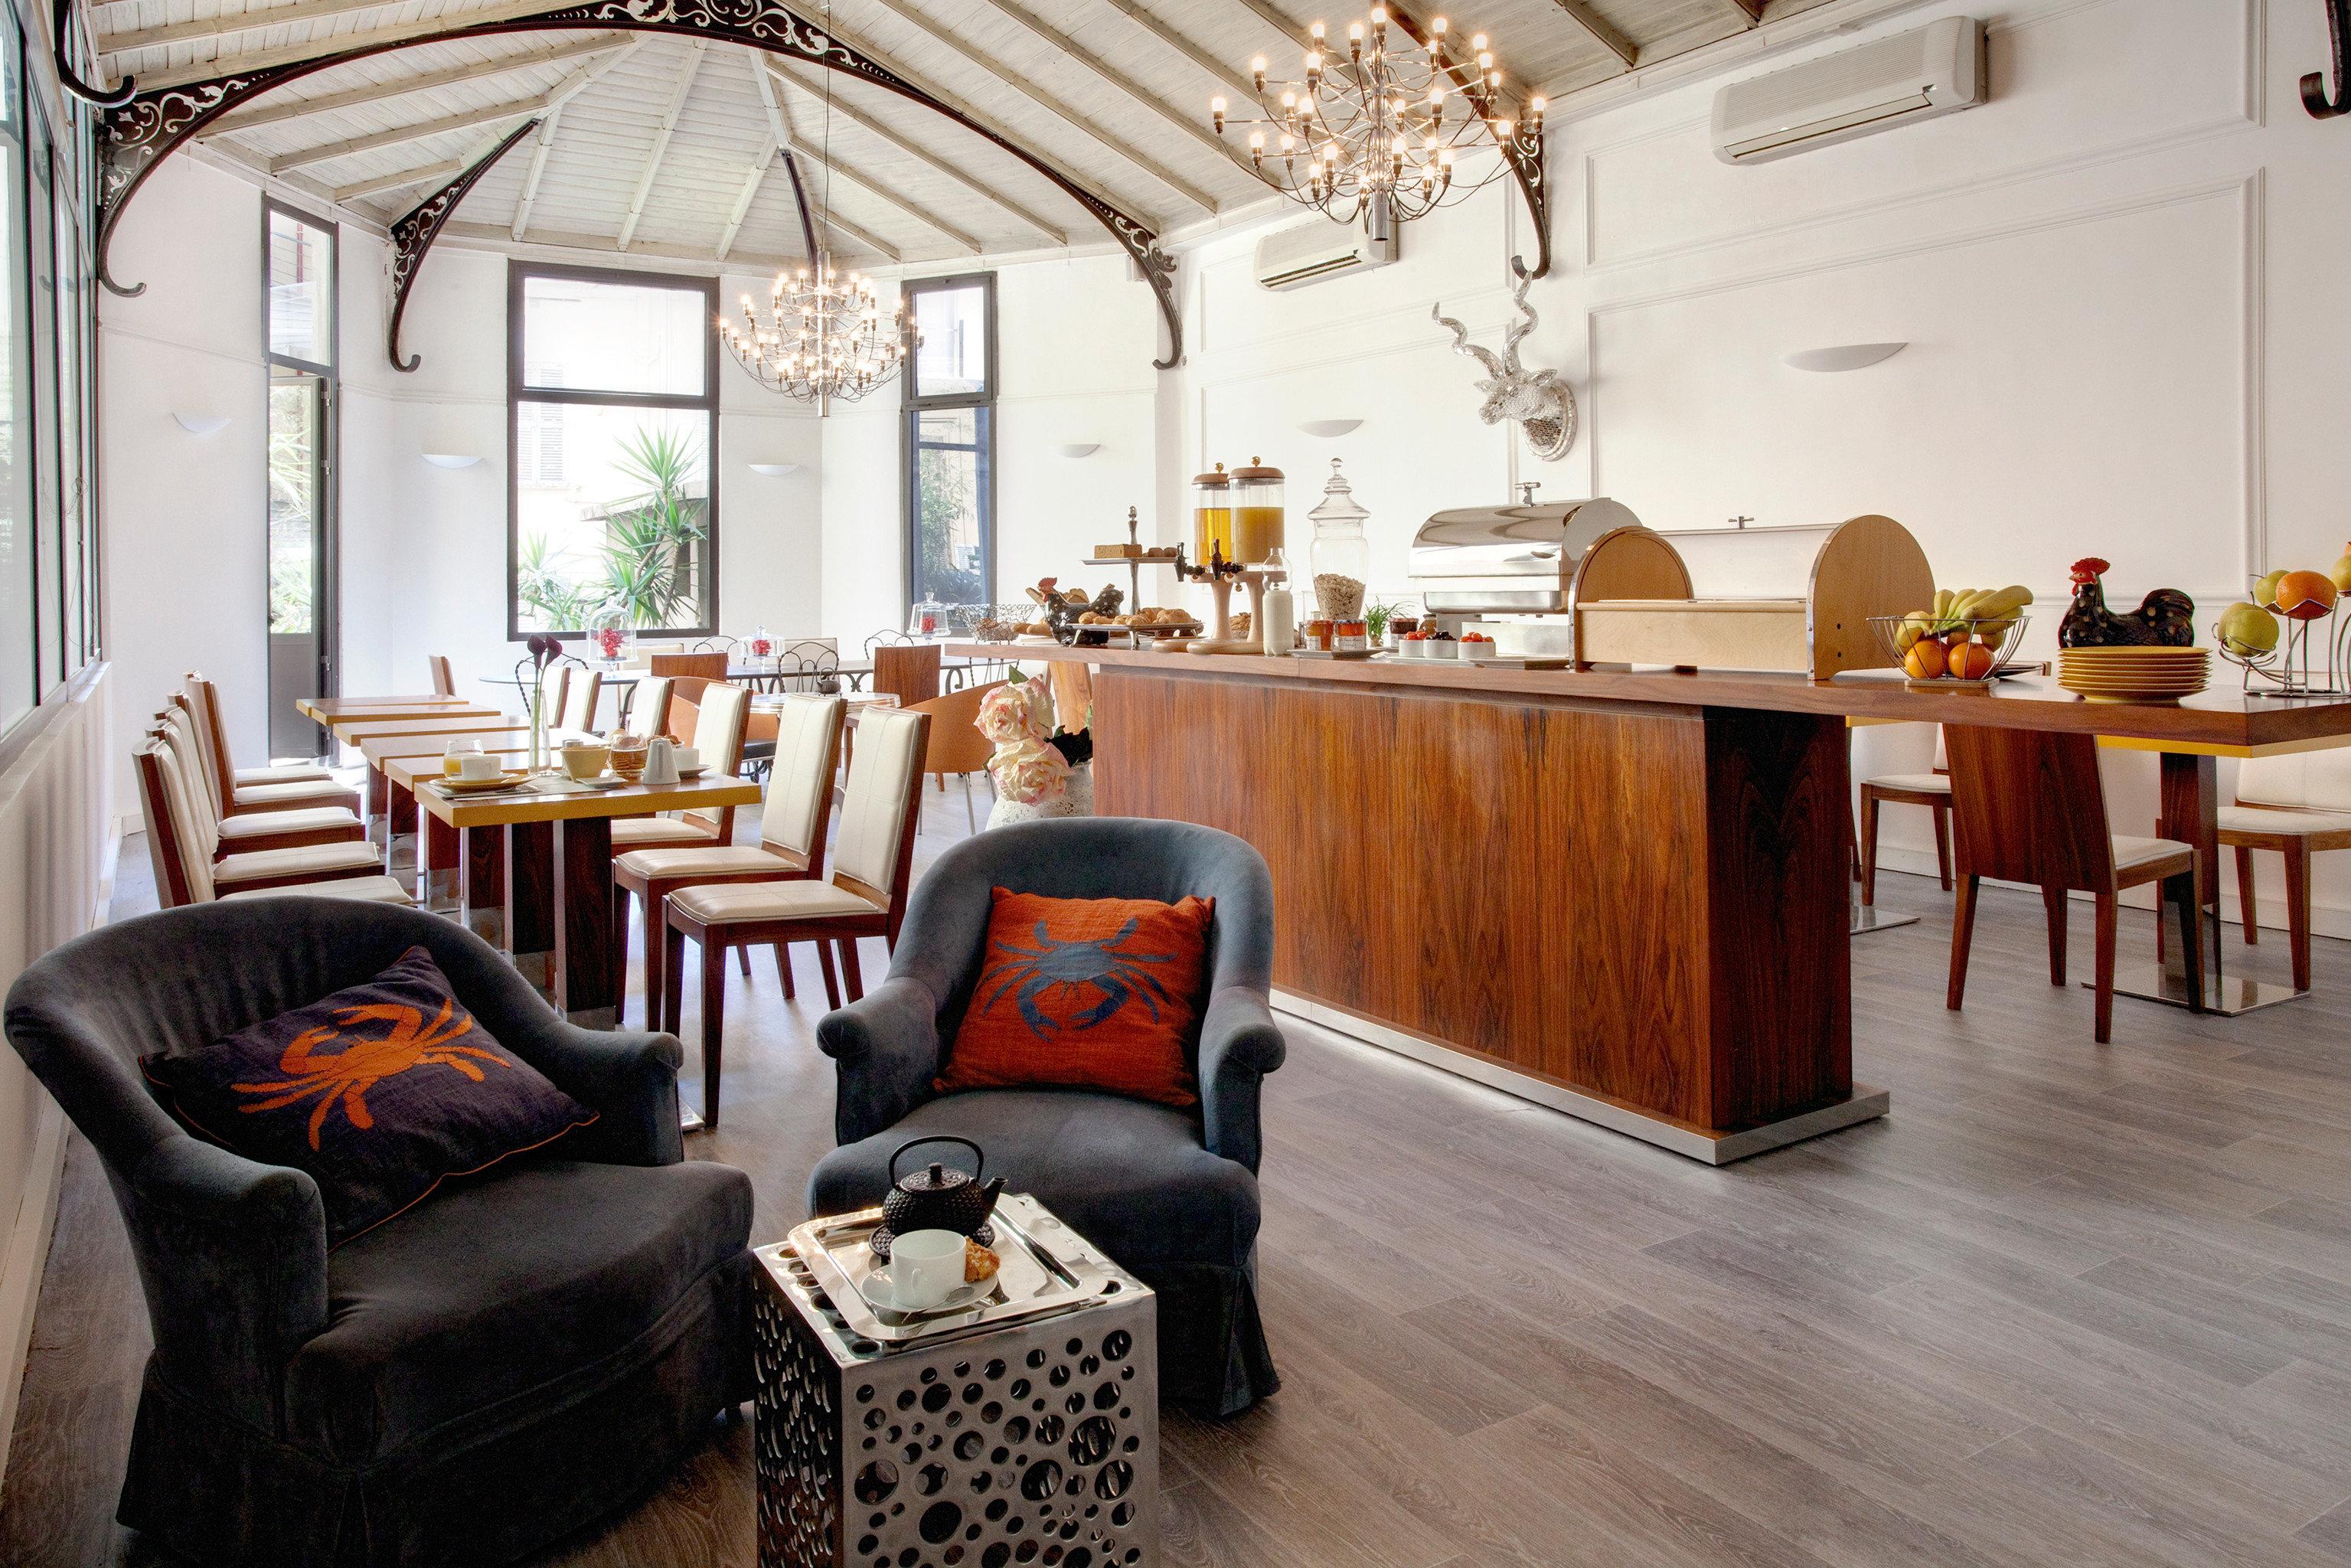 Dining Drink Eat Modern property home living room restaurant Lobby cottage flooring